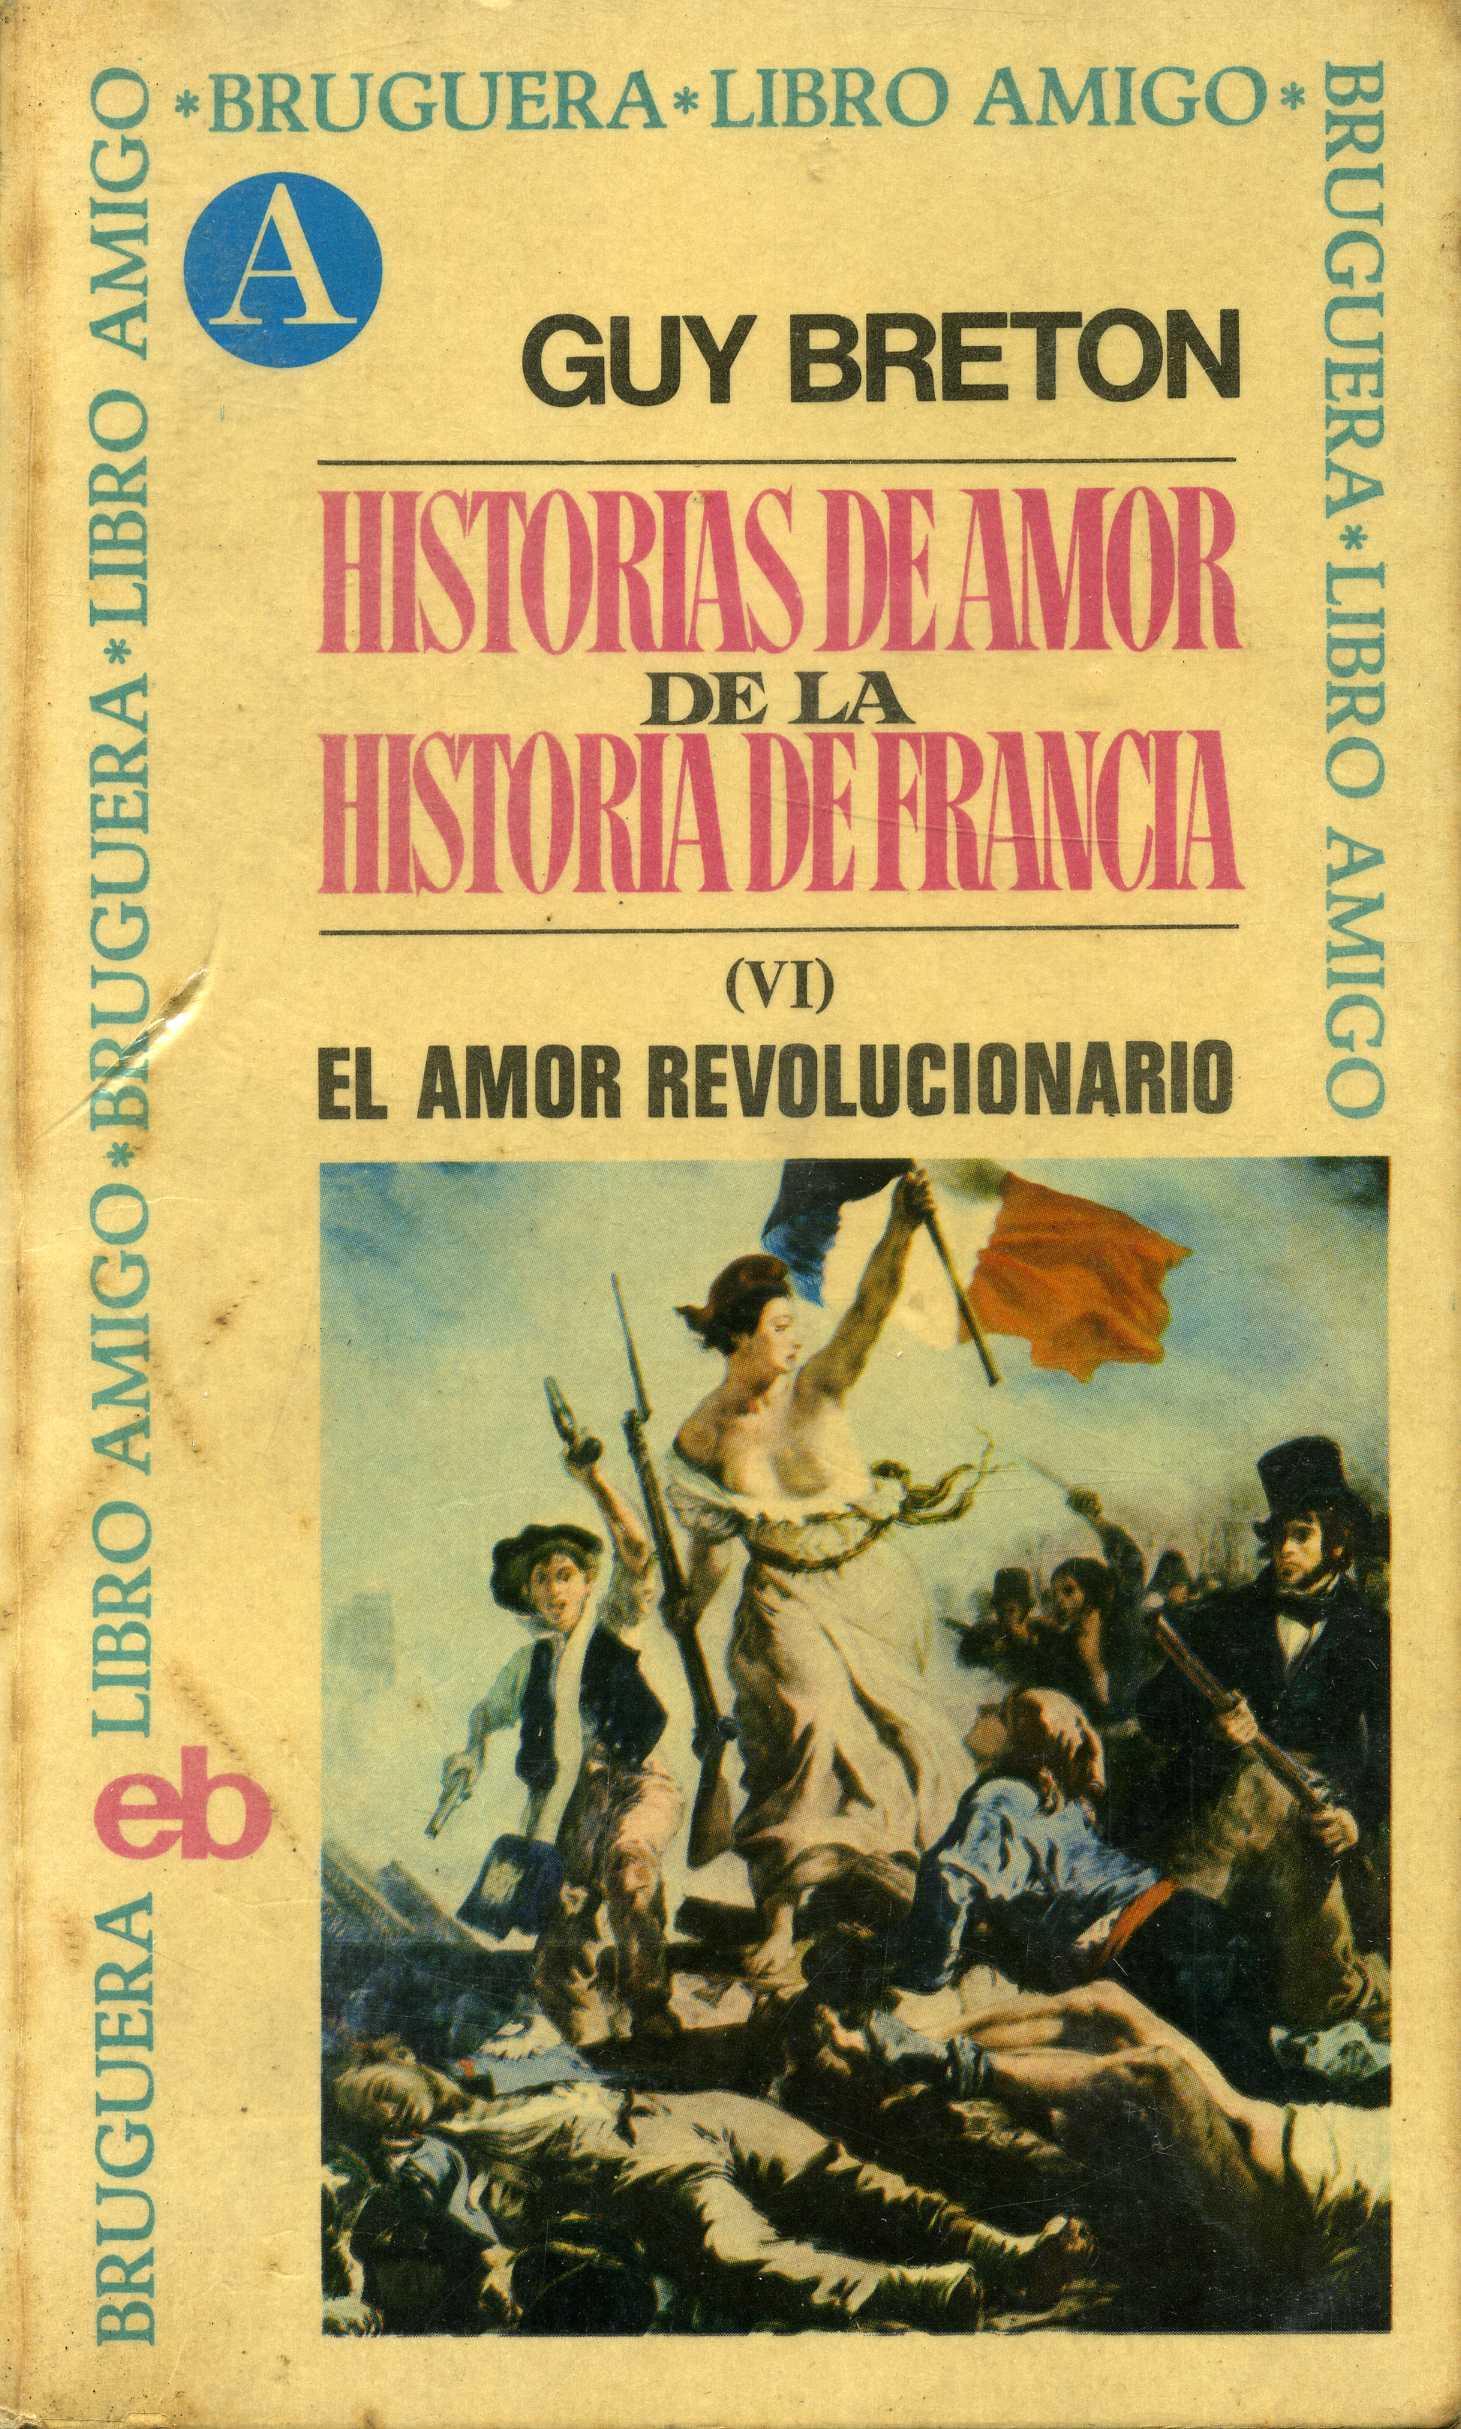 Historias de amor de la historia de Francia VI